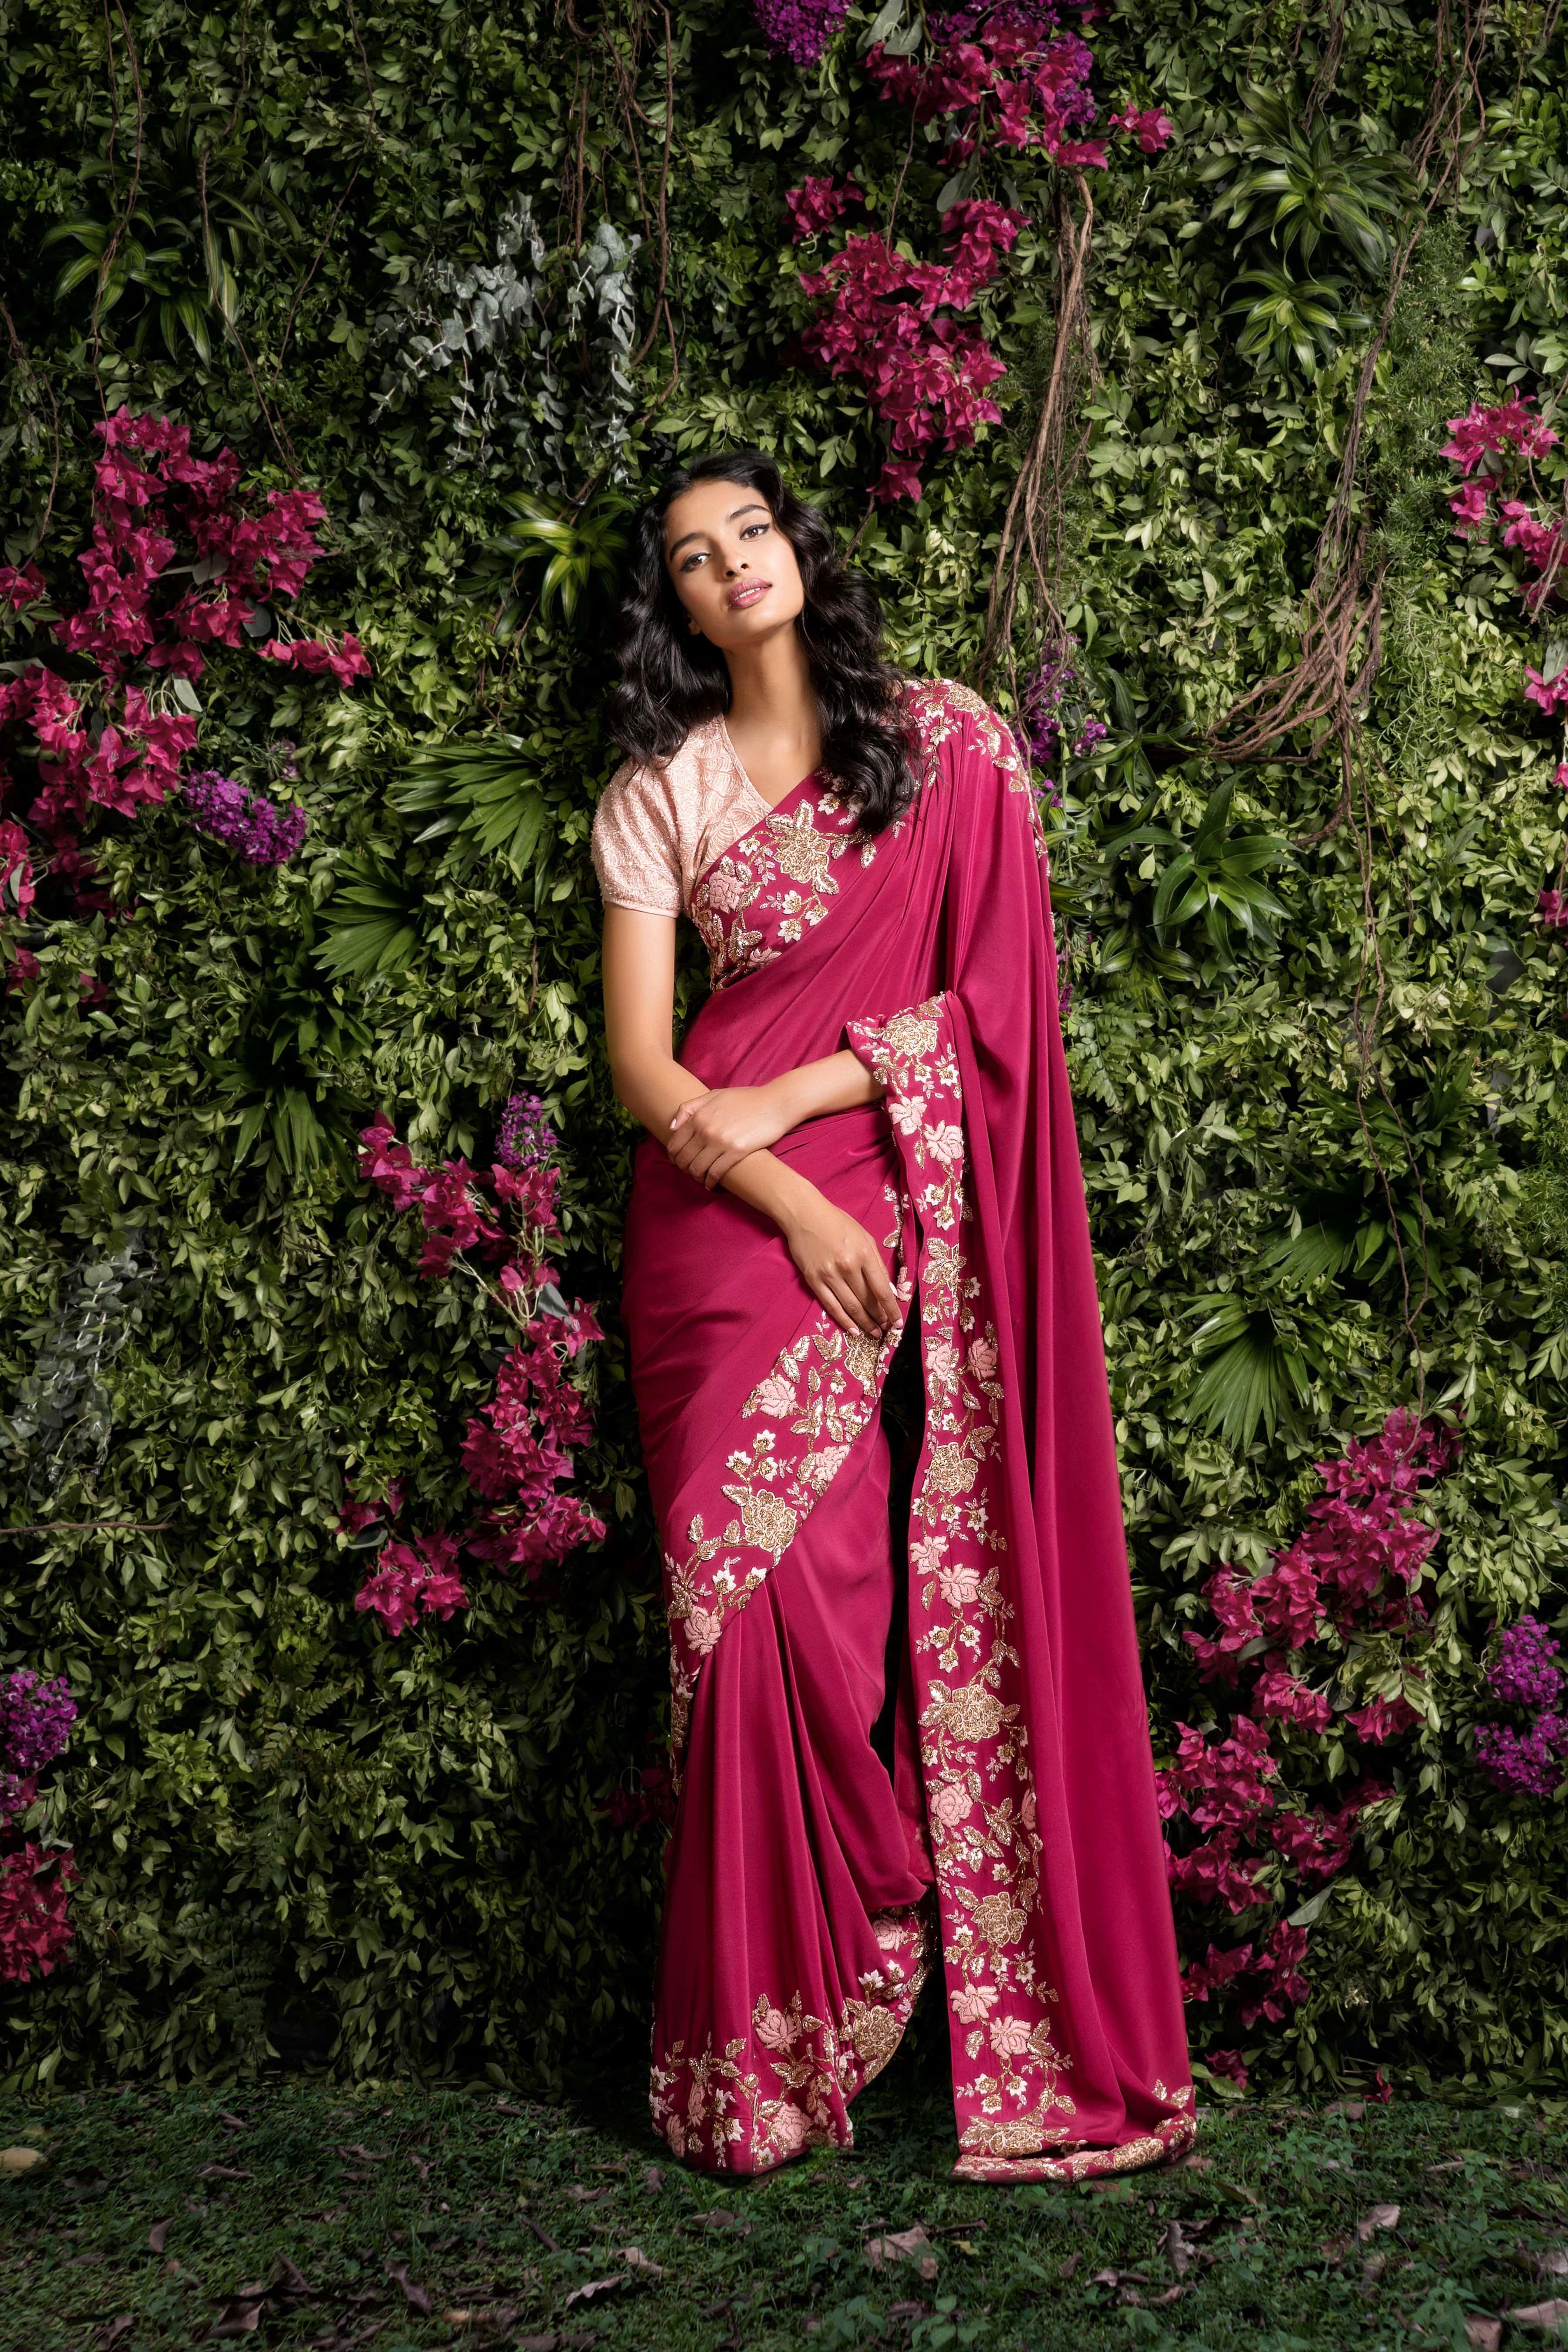 Passion homes borders gold zardozi border handmade designers - A Raspberry Wine Crepe Silk Sari With Zardosi And Peeta Border Handmade Embroidery